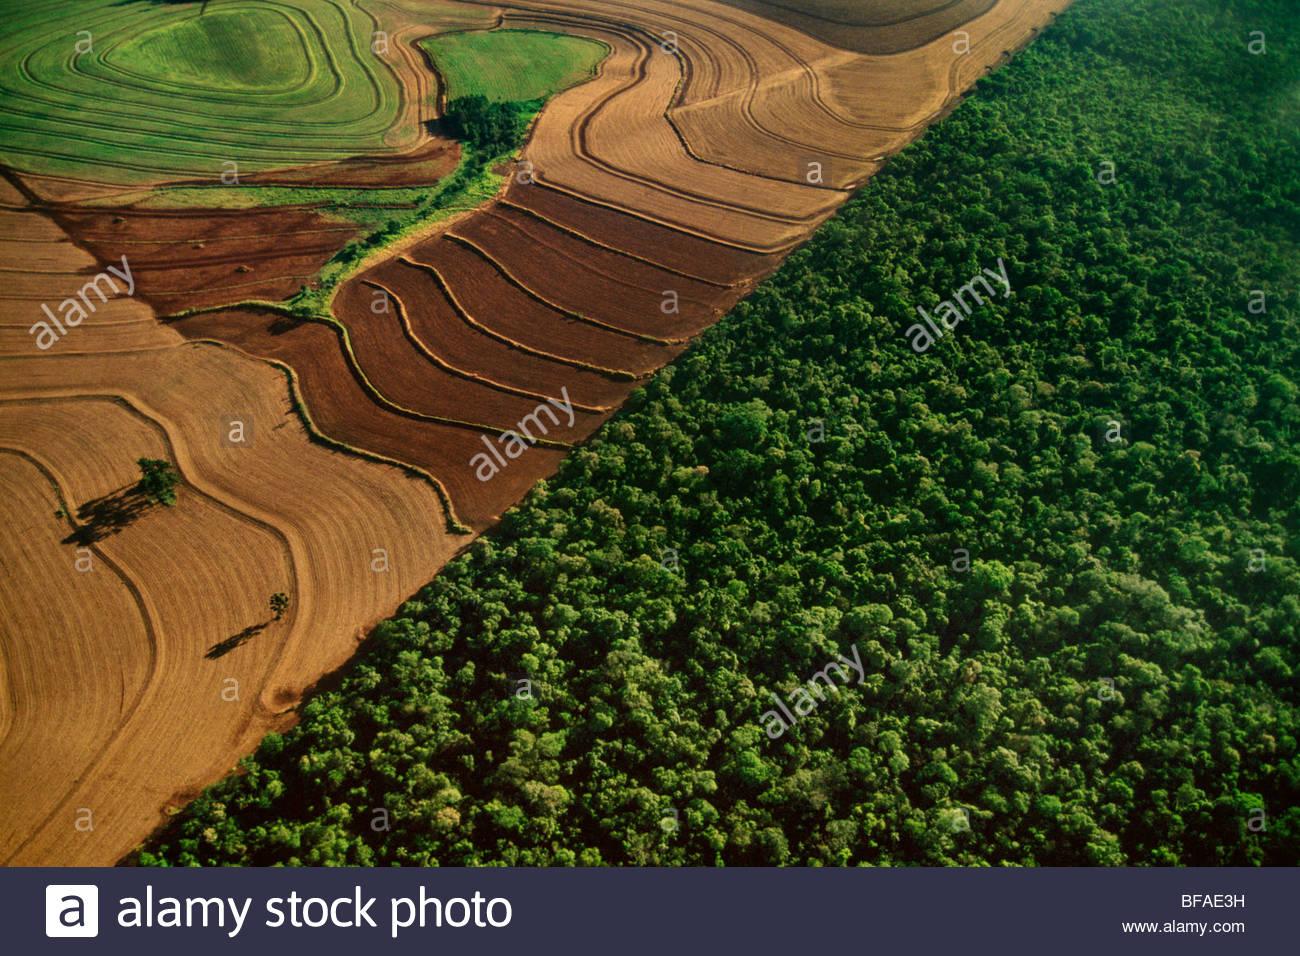 Cropland bordering rainforest habitat (aerial), Iguacu National Park, Brazil - Stock Image